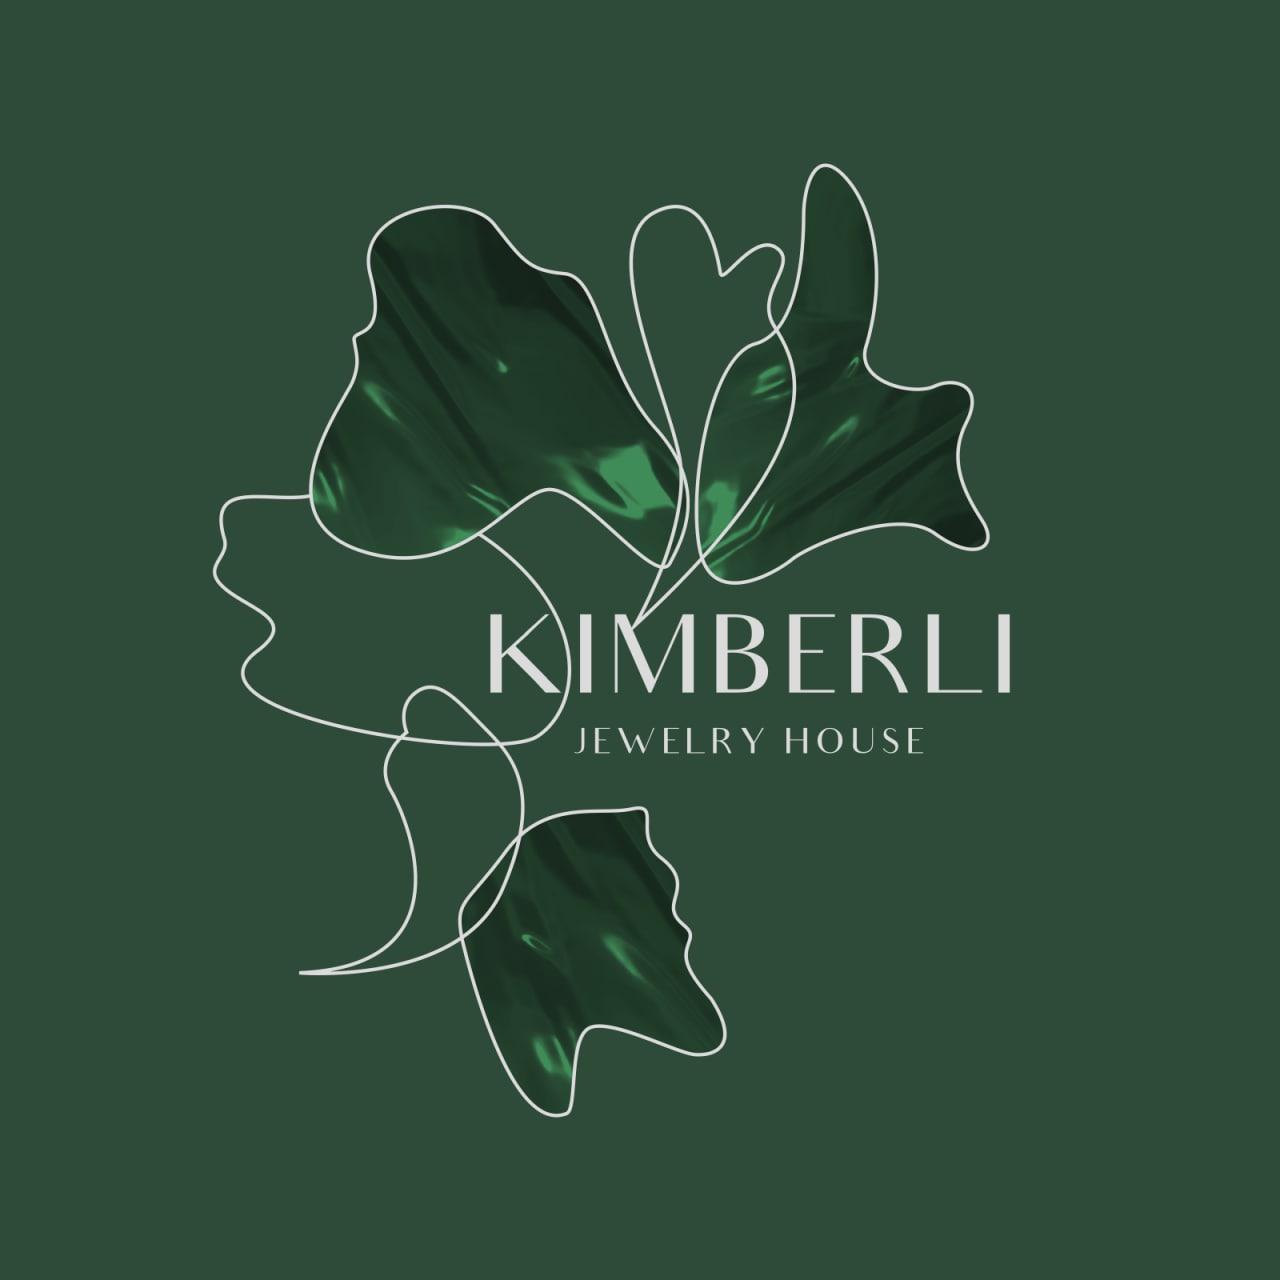 Kimberli Jewelry House